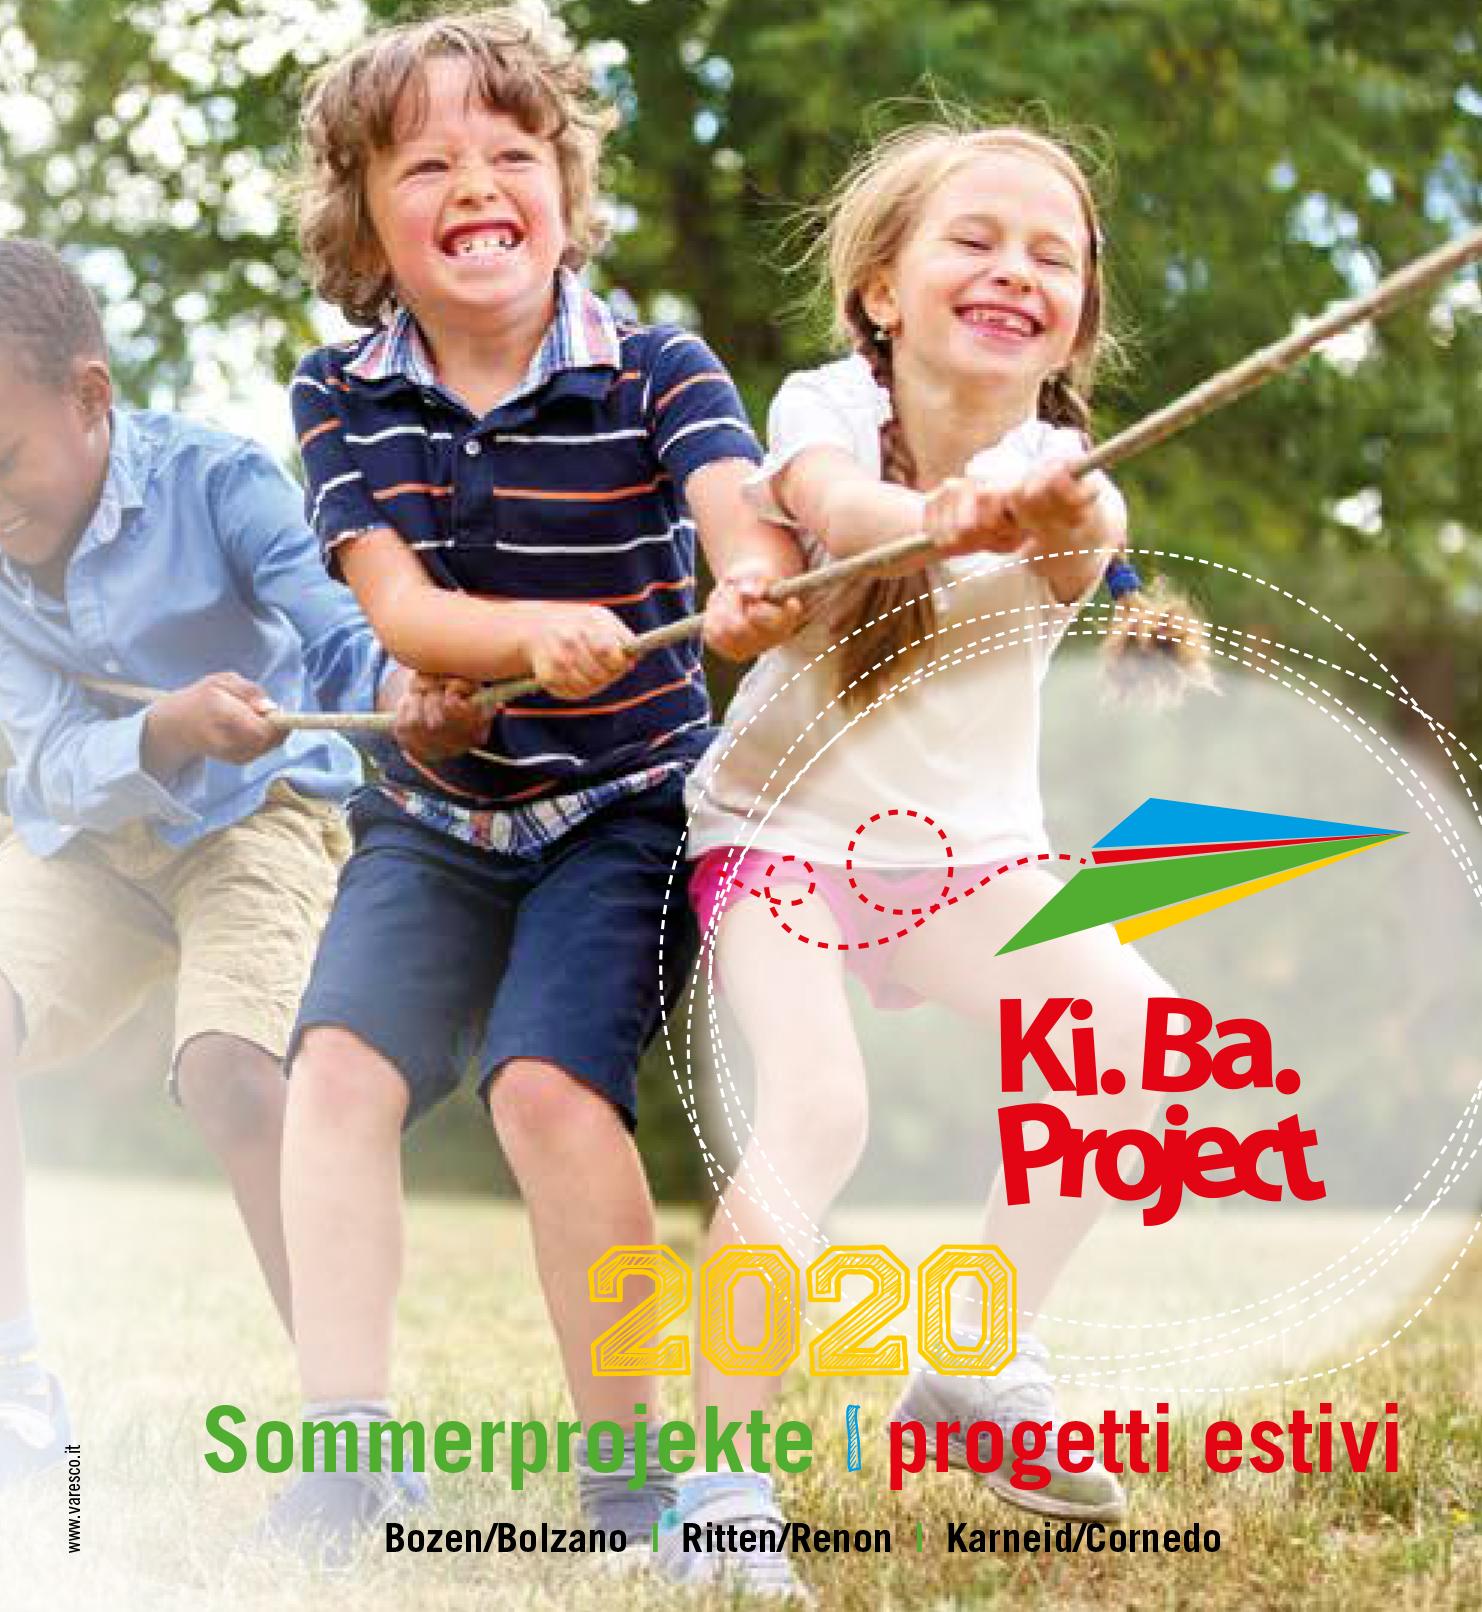 Sommerprojekte 2020